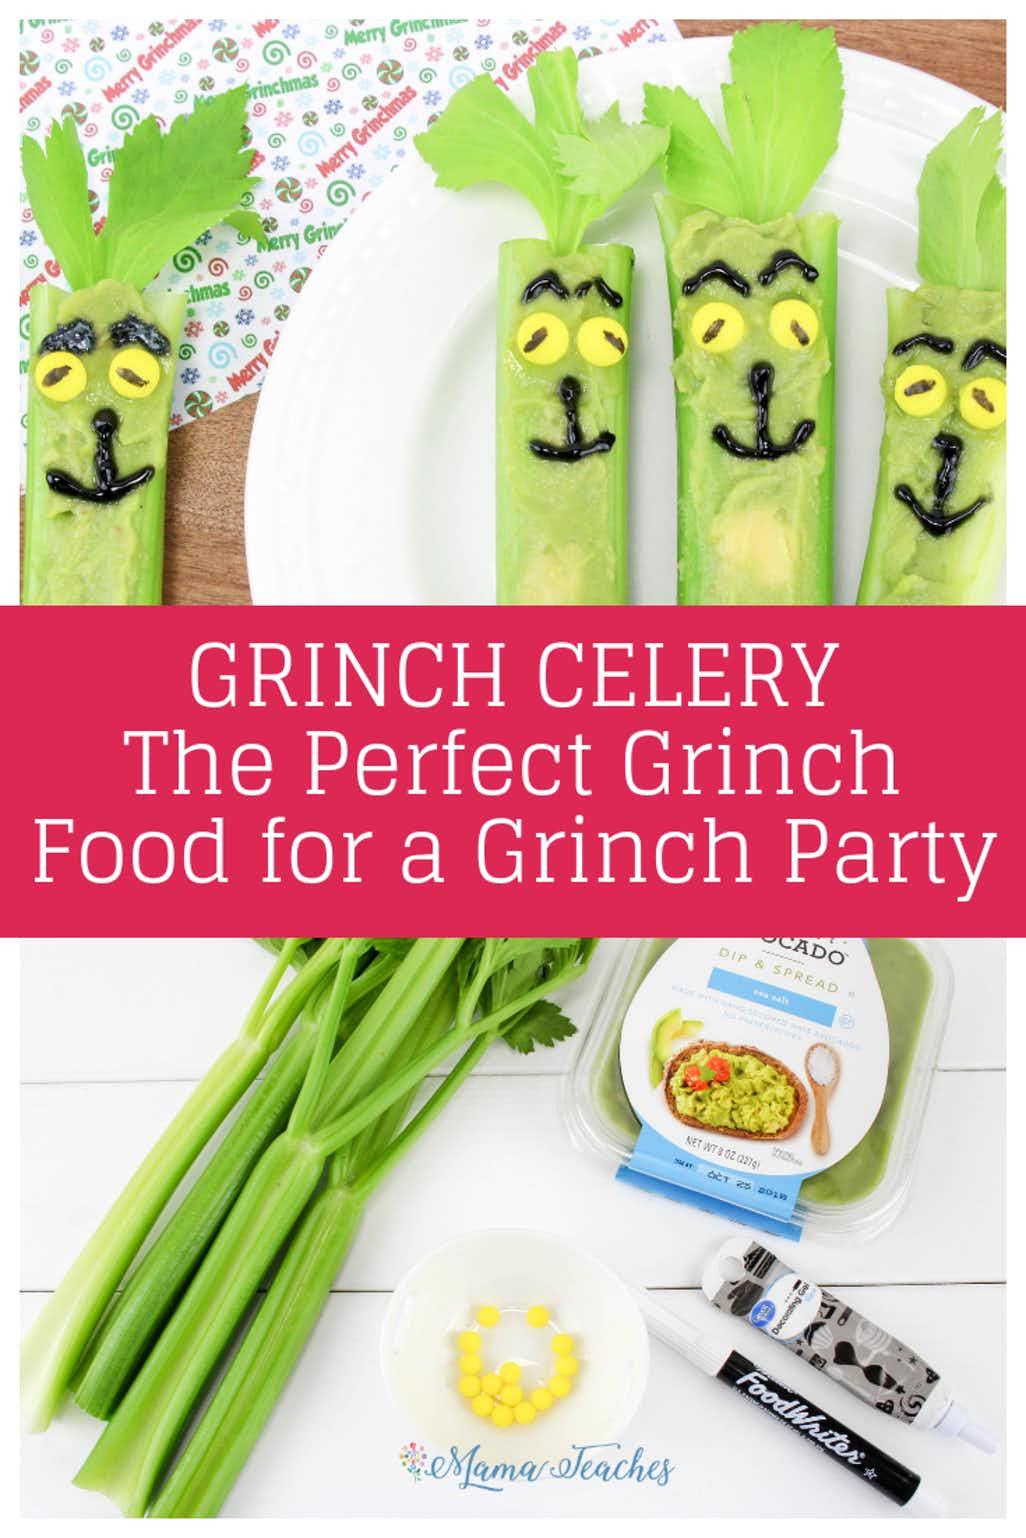 Easy Grinch Celery Recipe for Kids